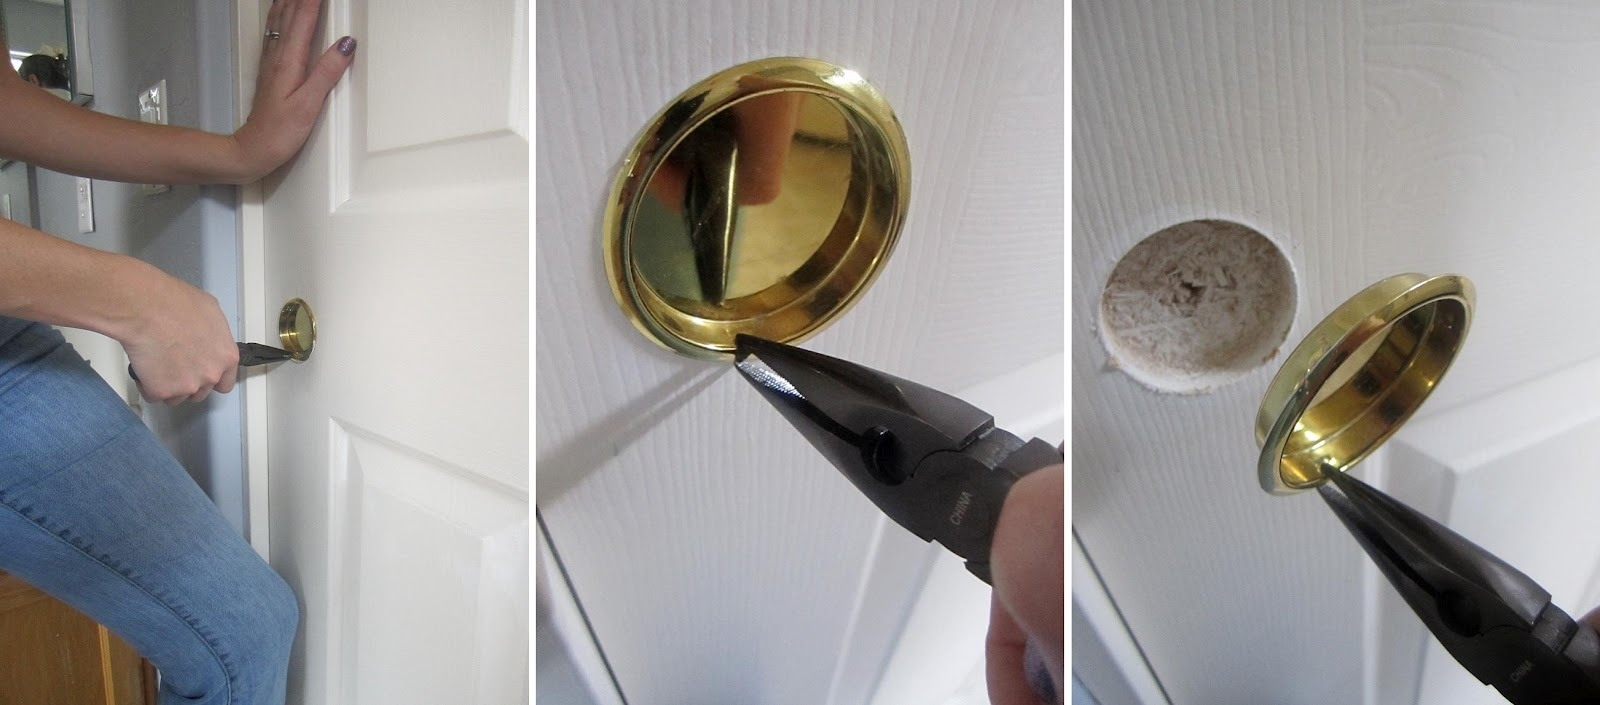 Round Sliding Closet Door Pullsthe creative cub diy door handle upgrade